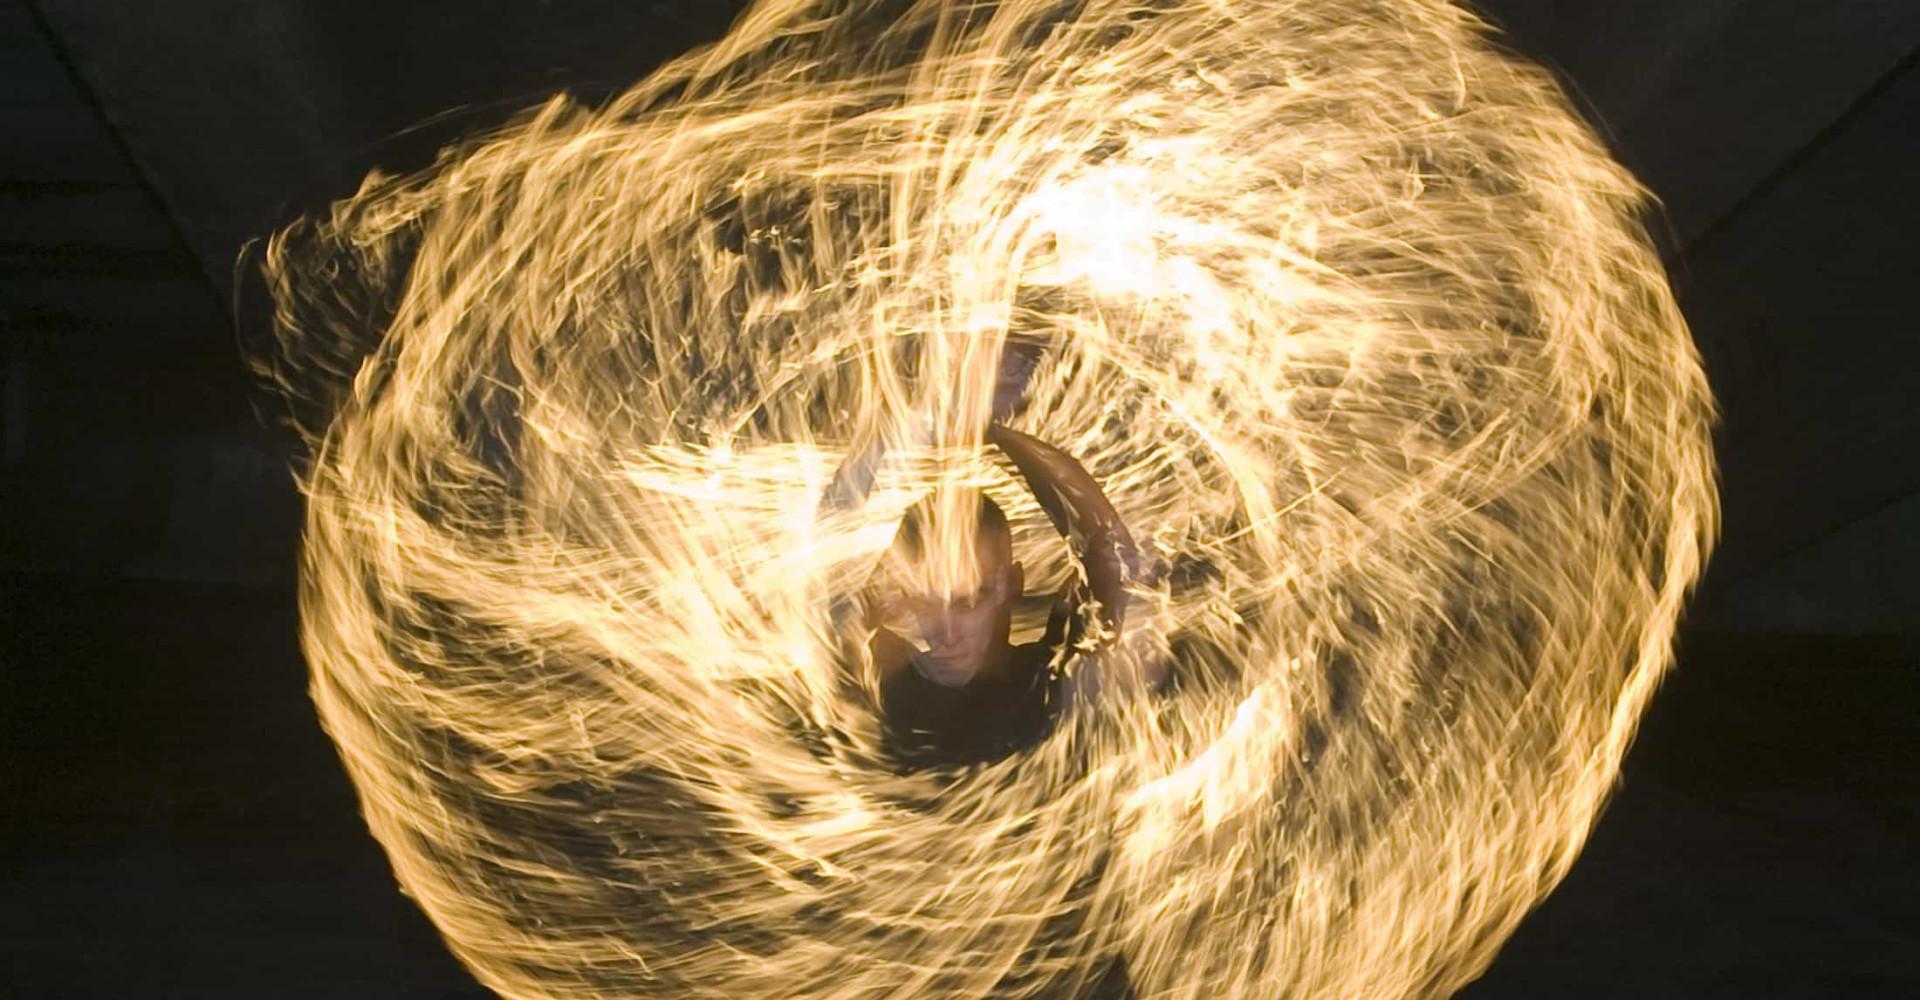 La danse du feu, un rituel aussi fabuleux qu'intemporel